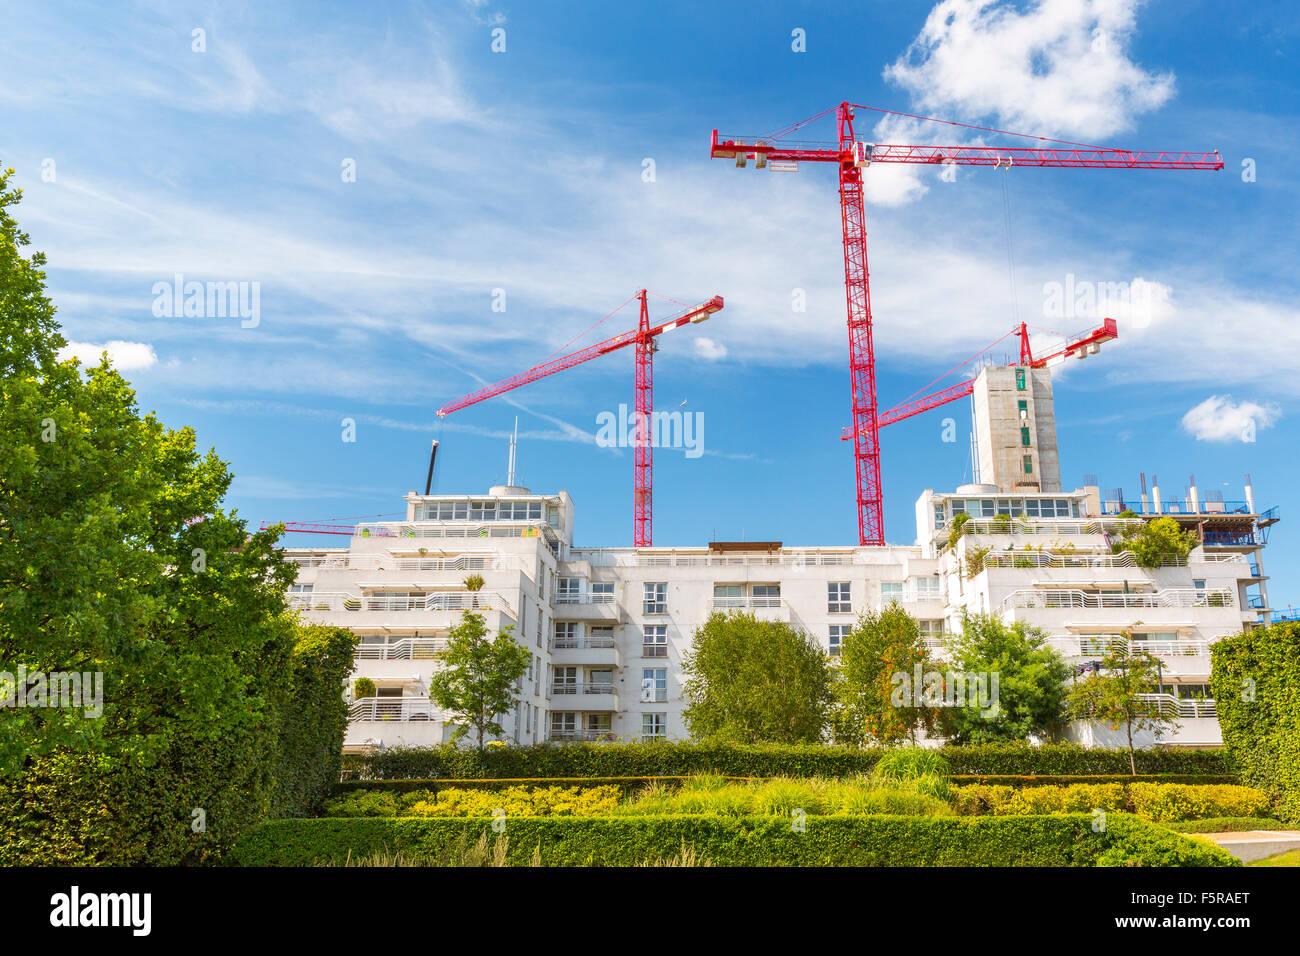 Construction Tower Cranes dominating a London Suburb skyline, England, UK - Stock Image